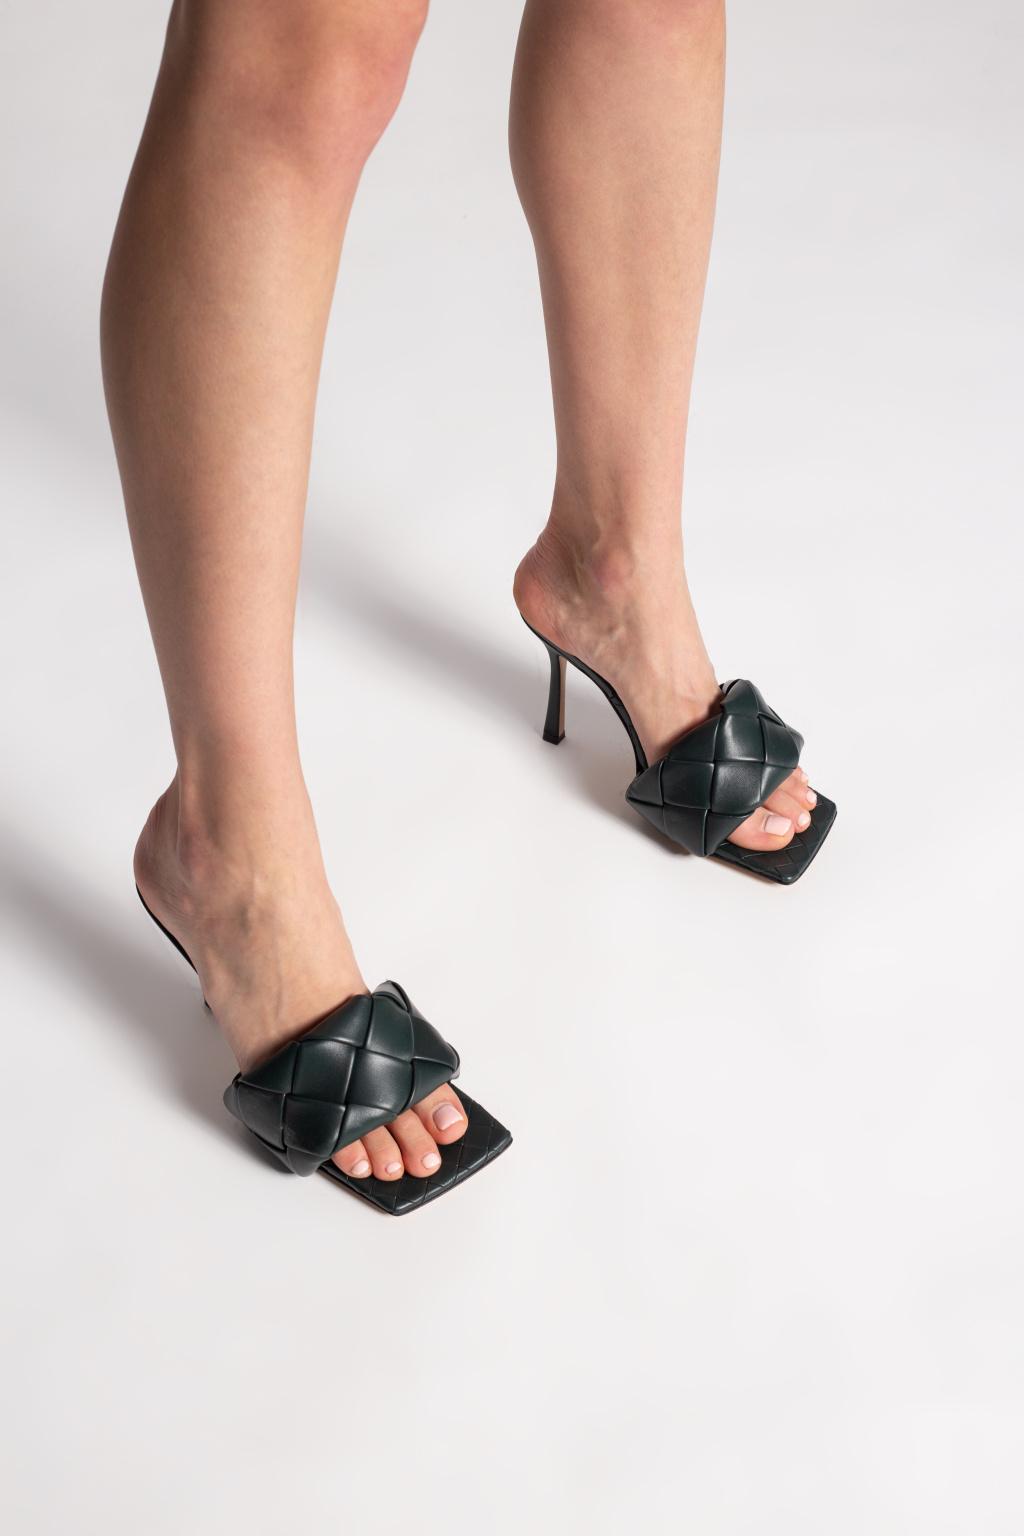 Bottega Veneta 'Lido' heeled mules